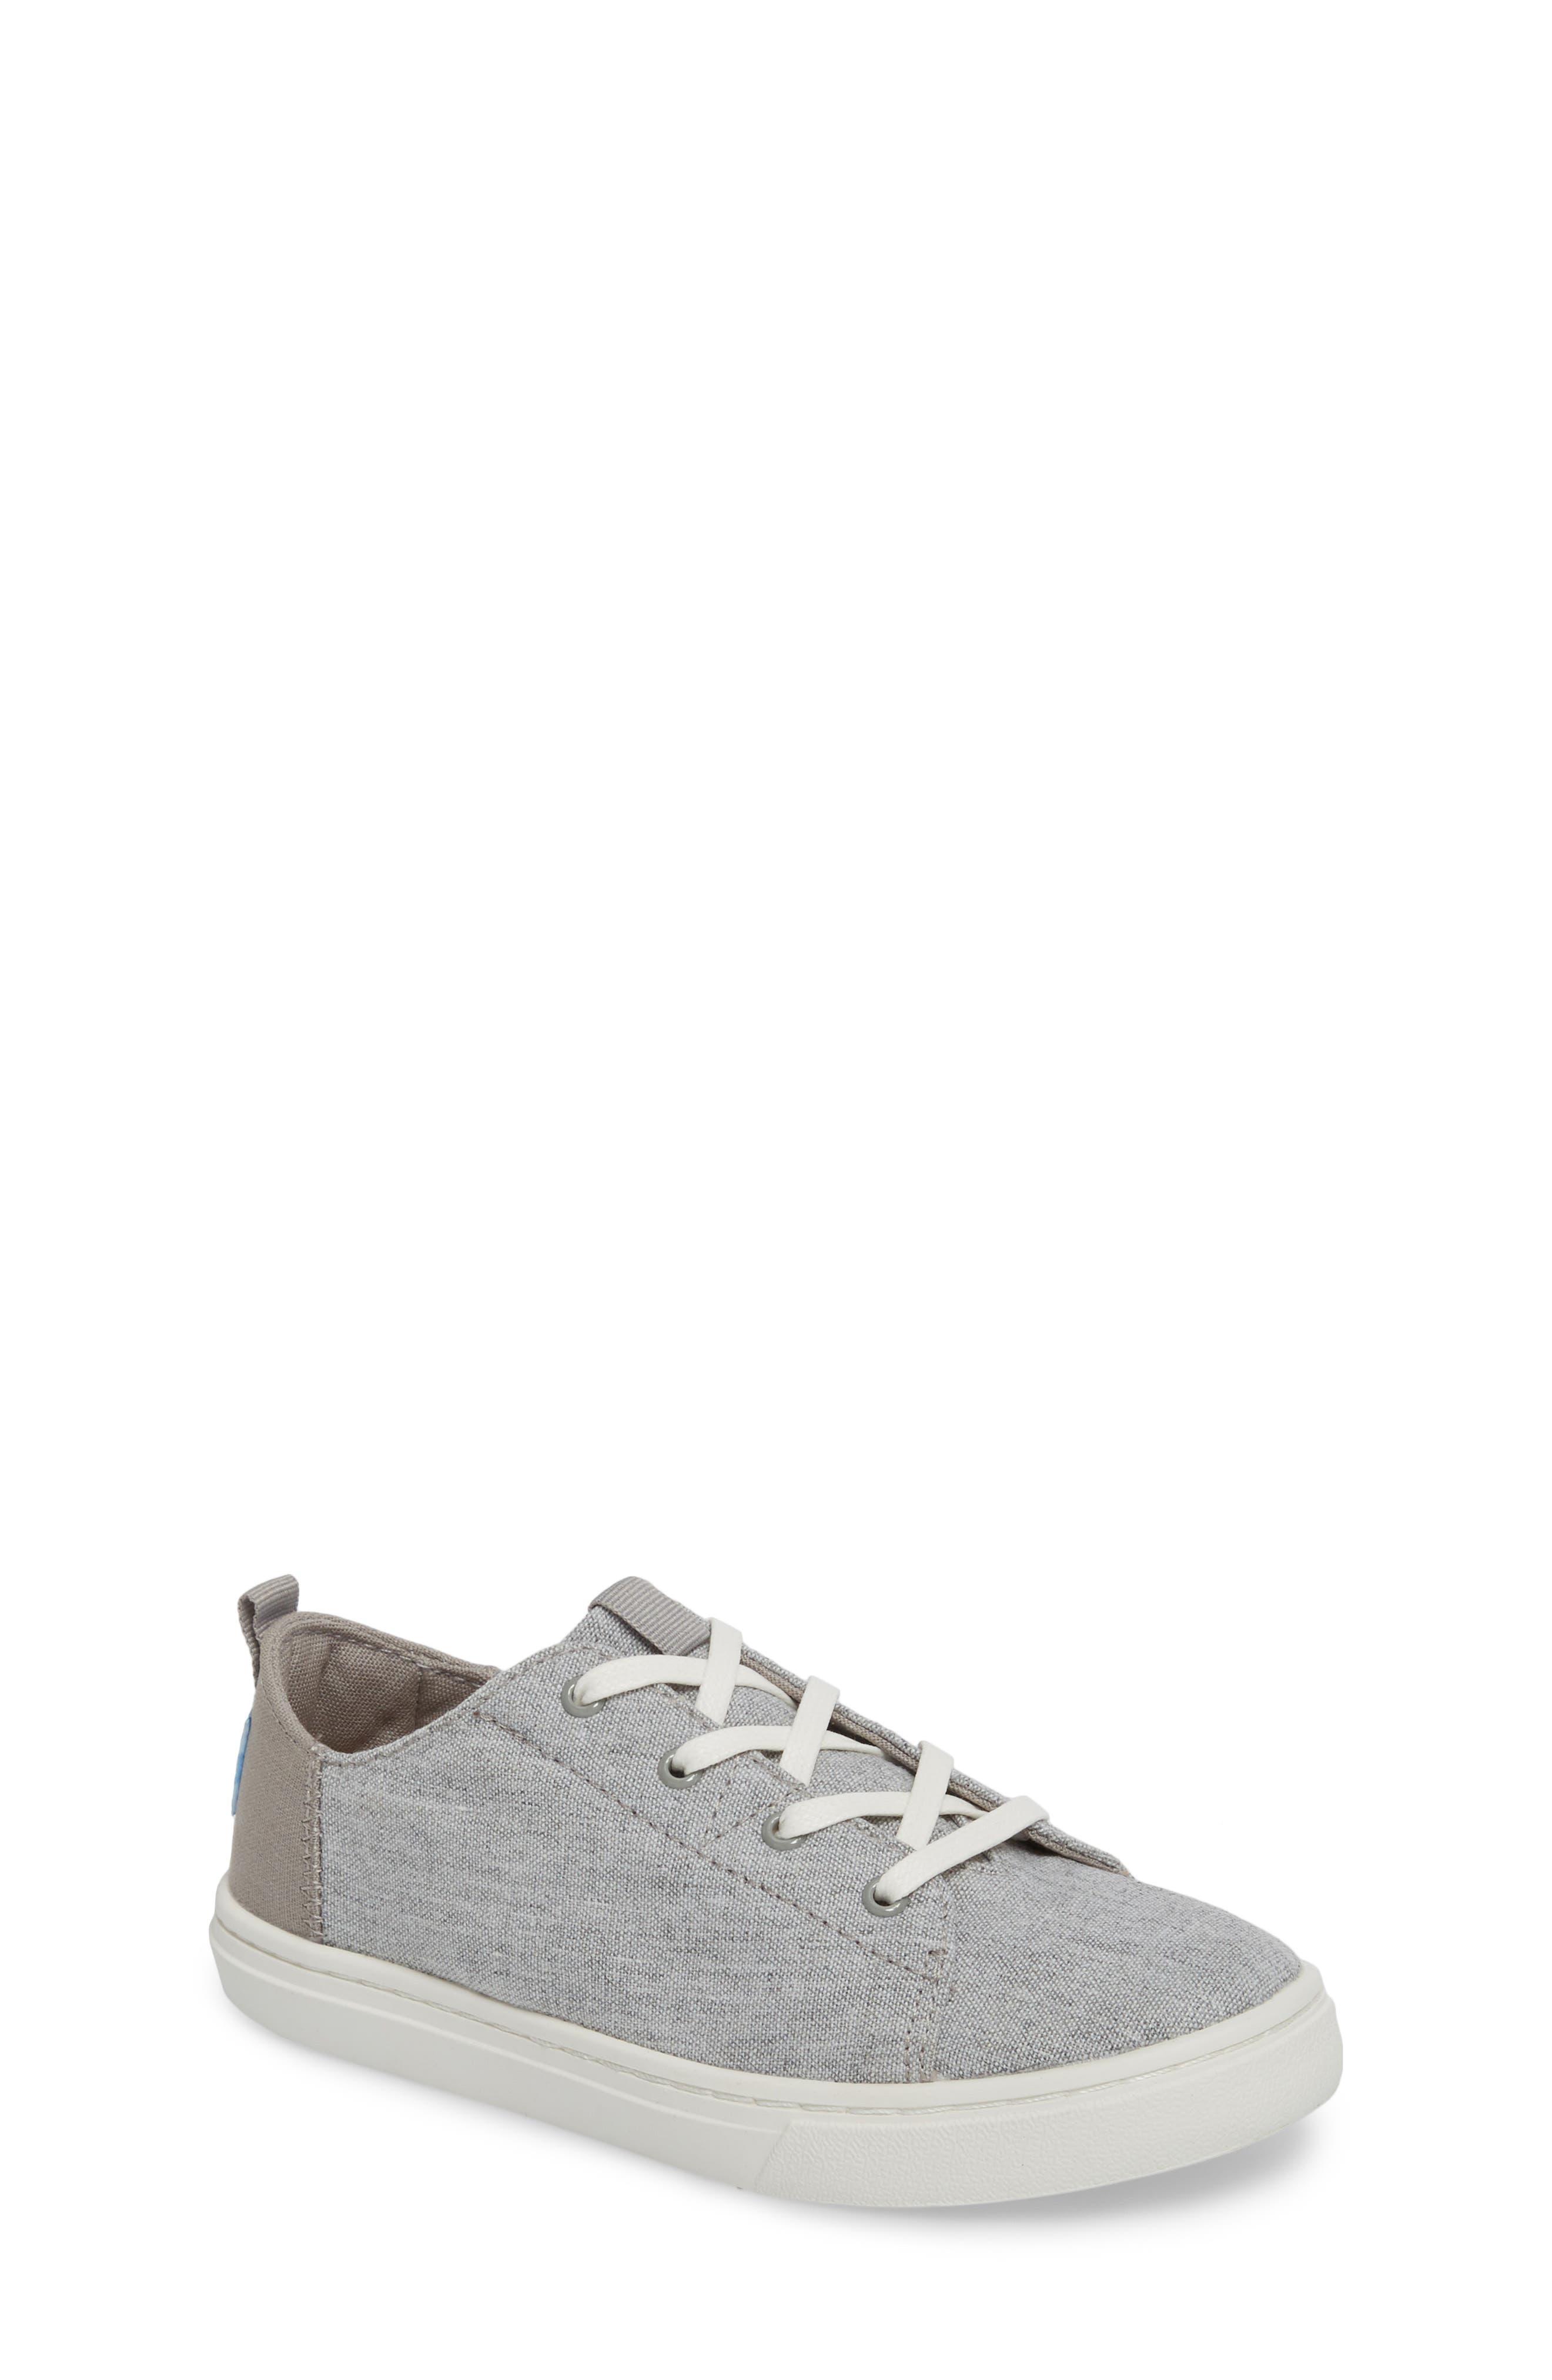 Lenny Sneaker,                             Main thumbnail 1, color,                             Drizzle Grey Slub Chambray